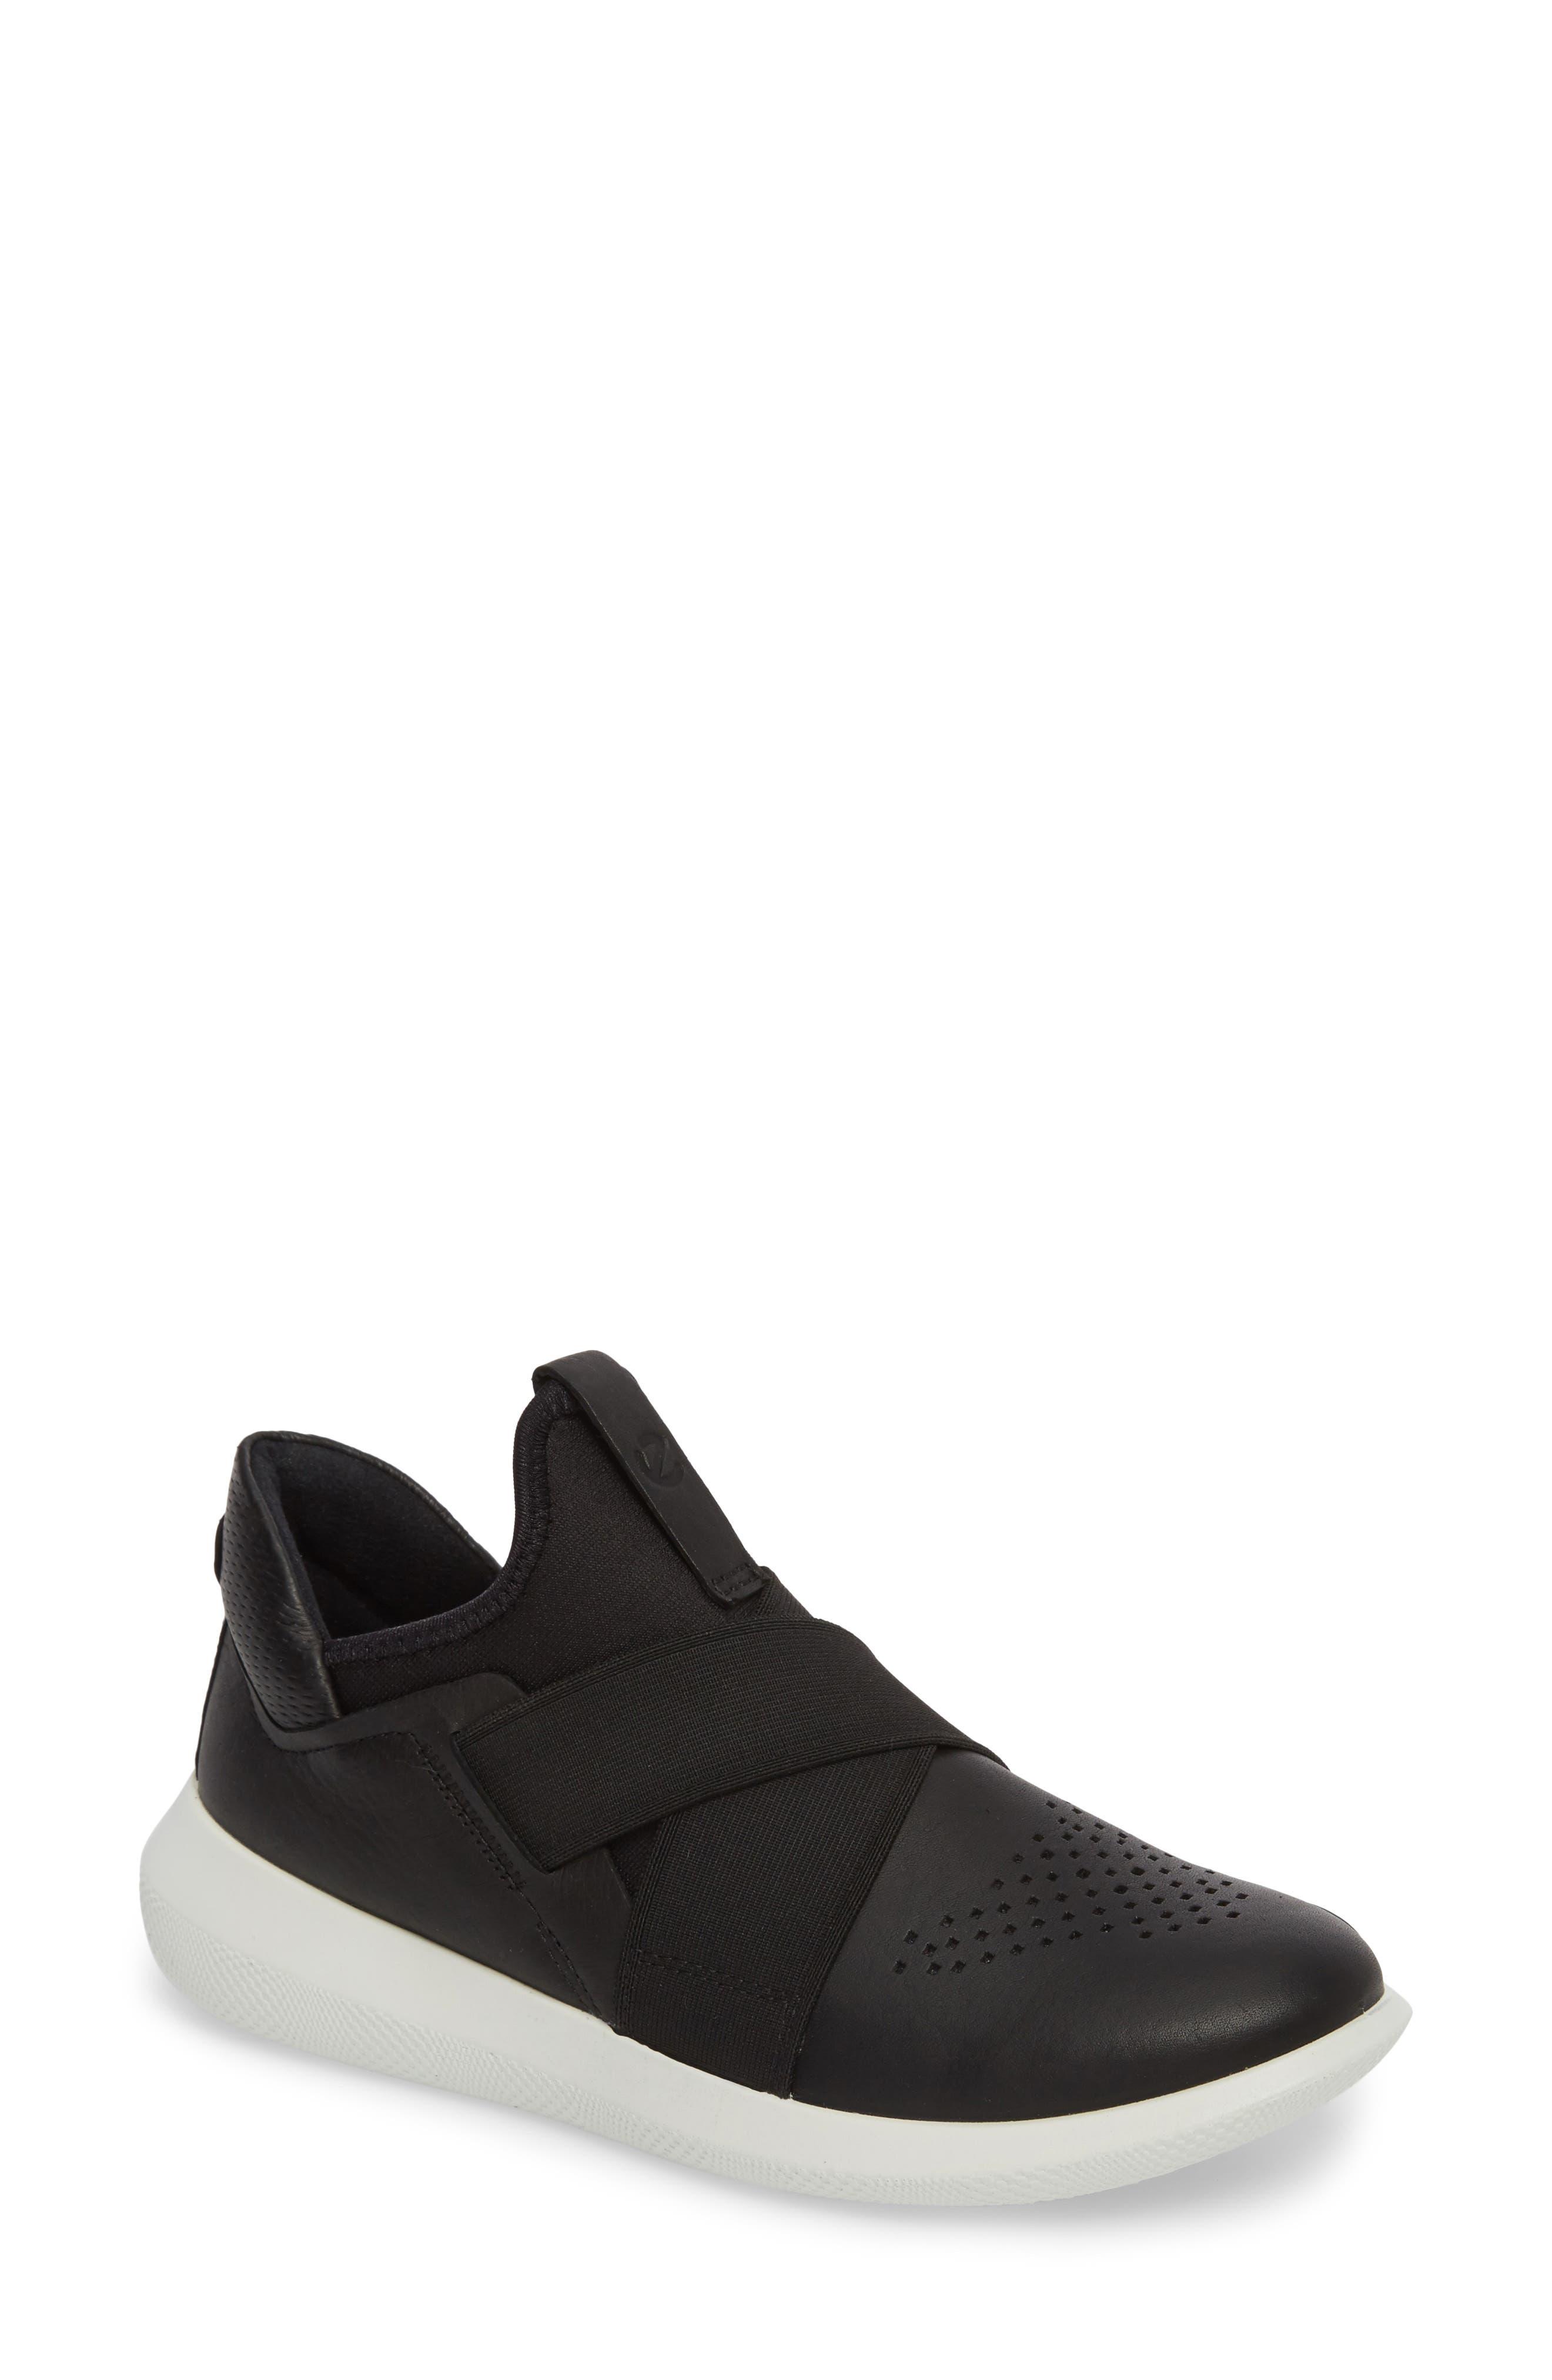 Scinapse Band Sneaker,                             Main thumbnail 1, color,                             Black